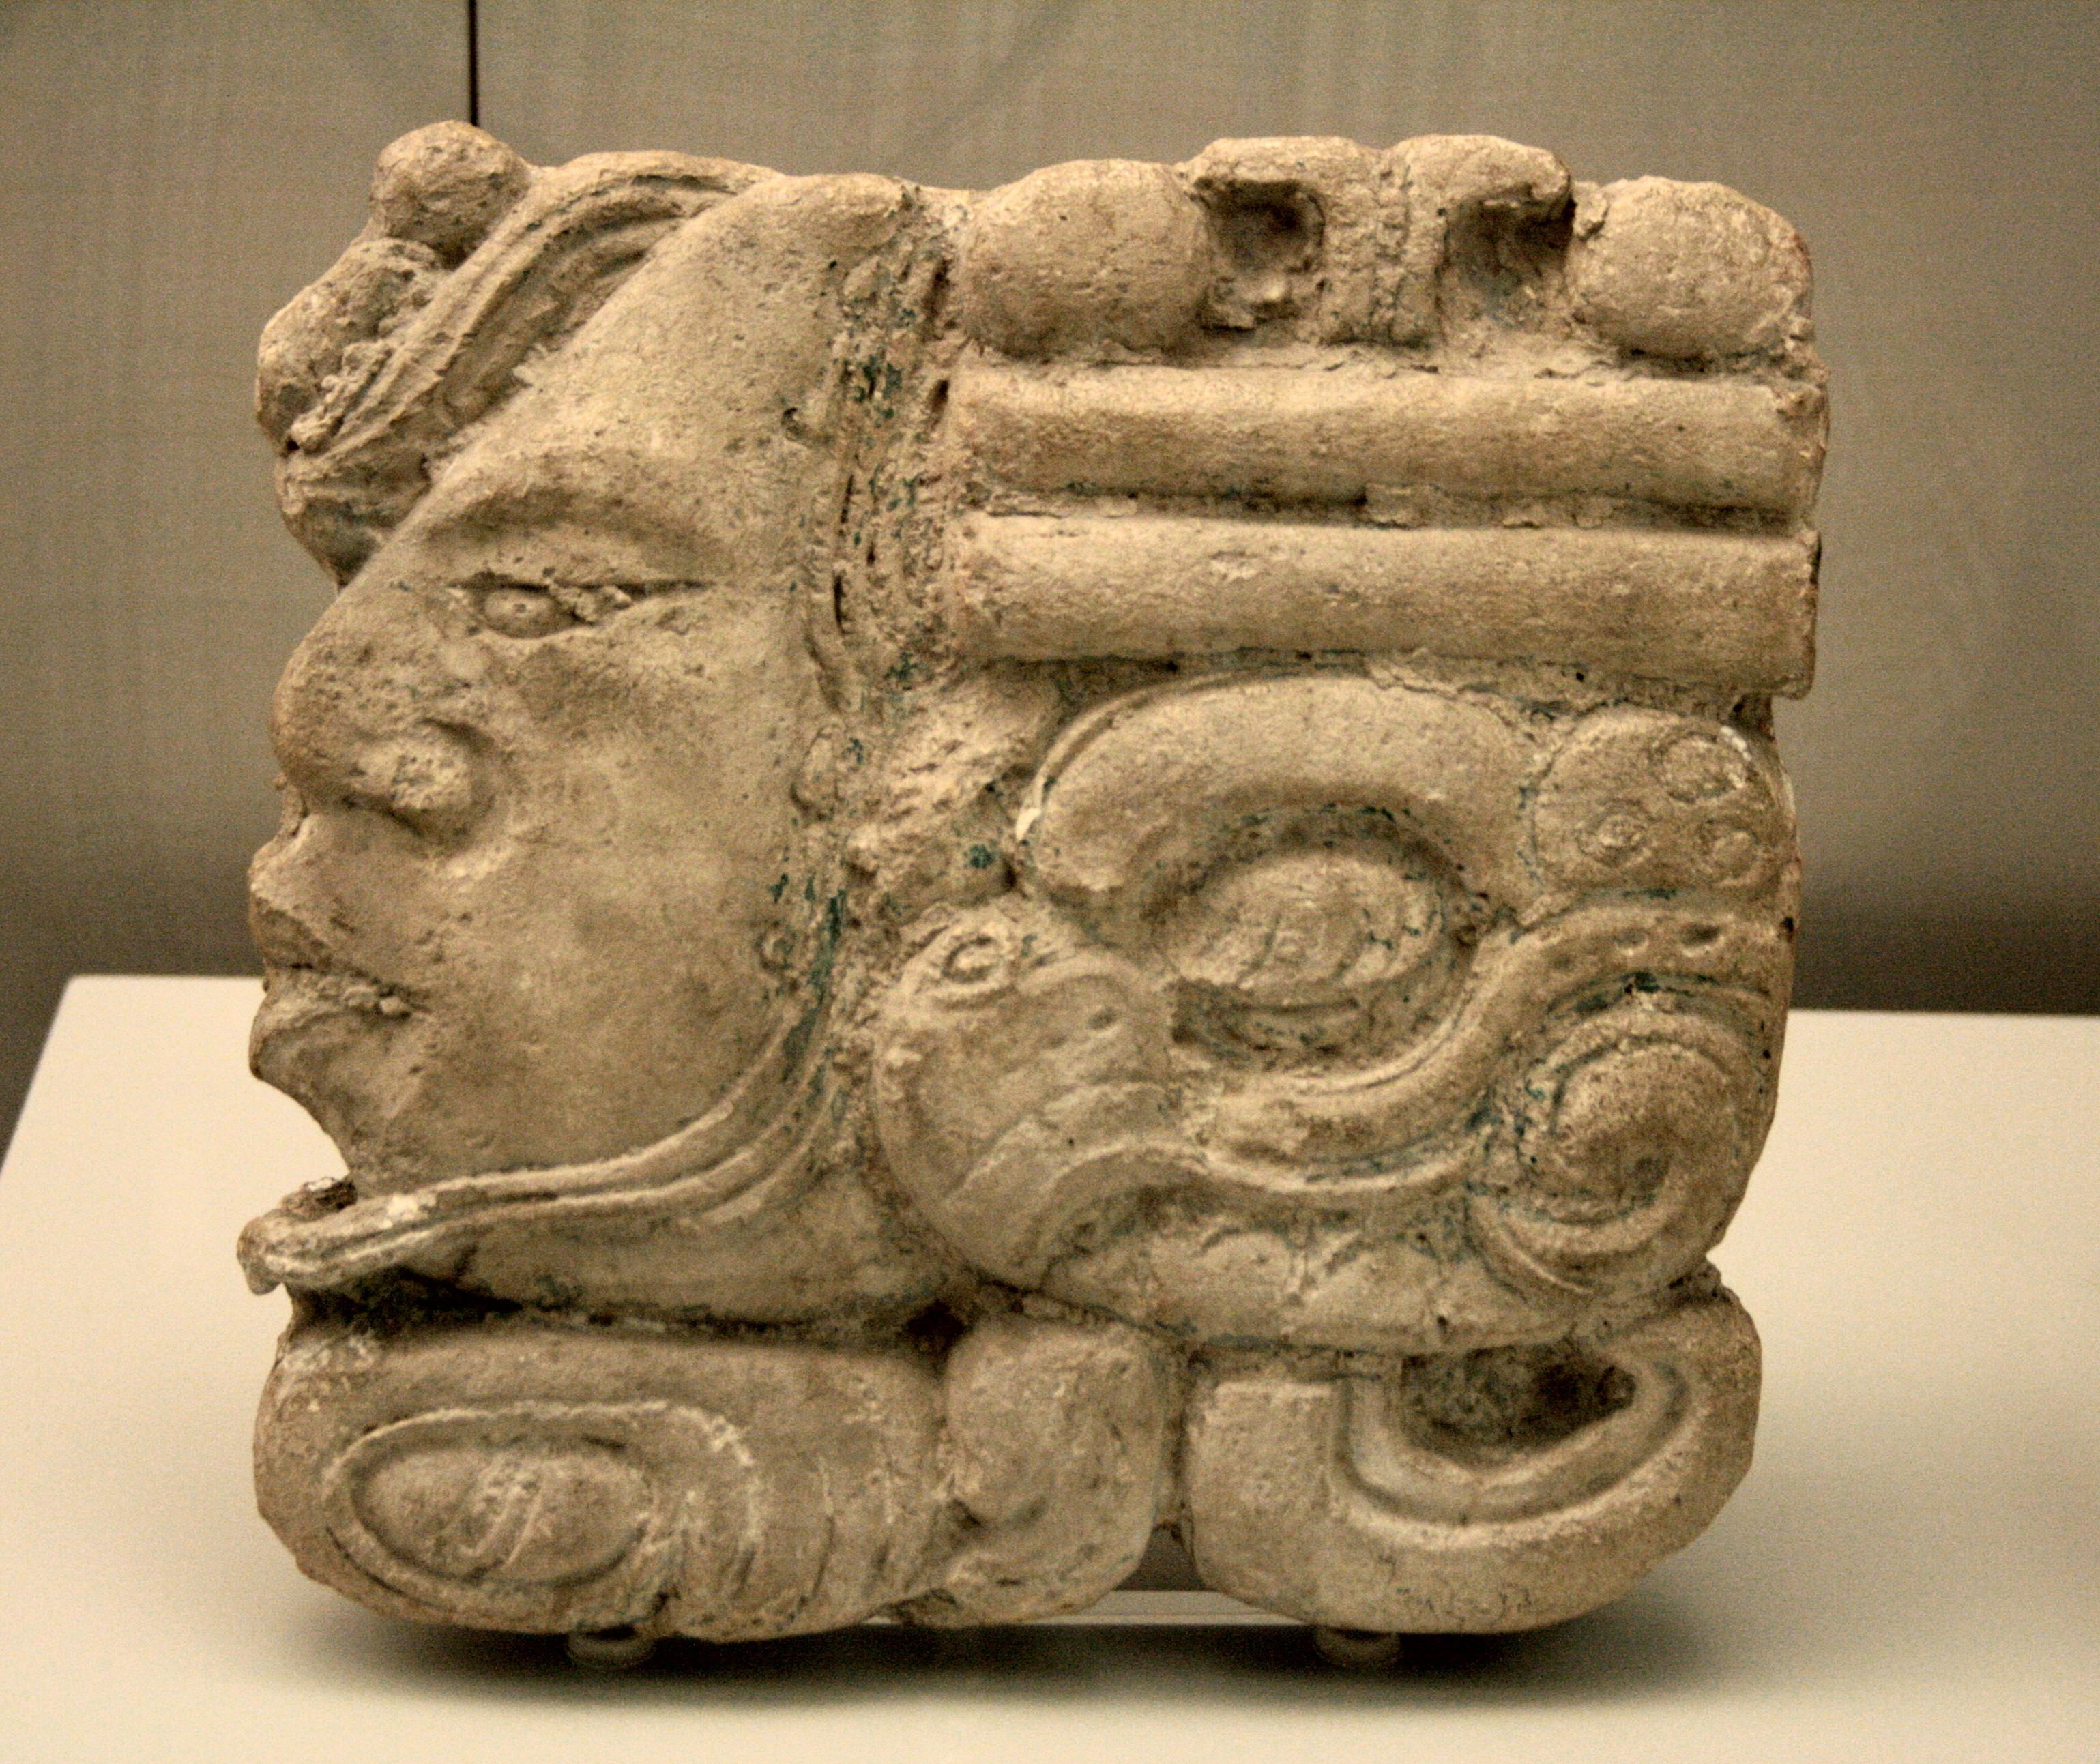 GUERRIER JAGUAR - ALEXANDROS MODELS 75mm Museo_de_Am%C3%A9rica_Maya_glyph